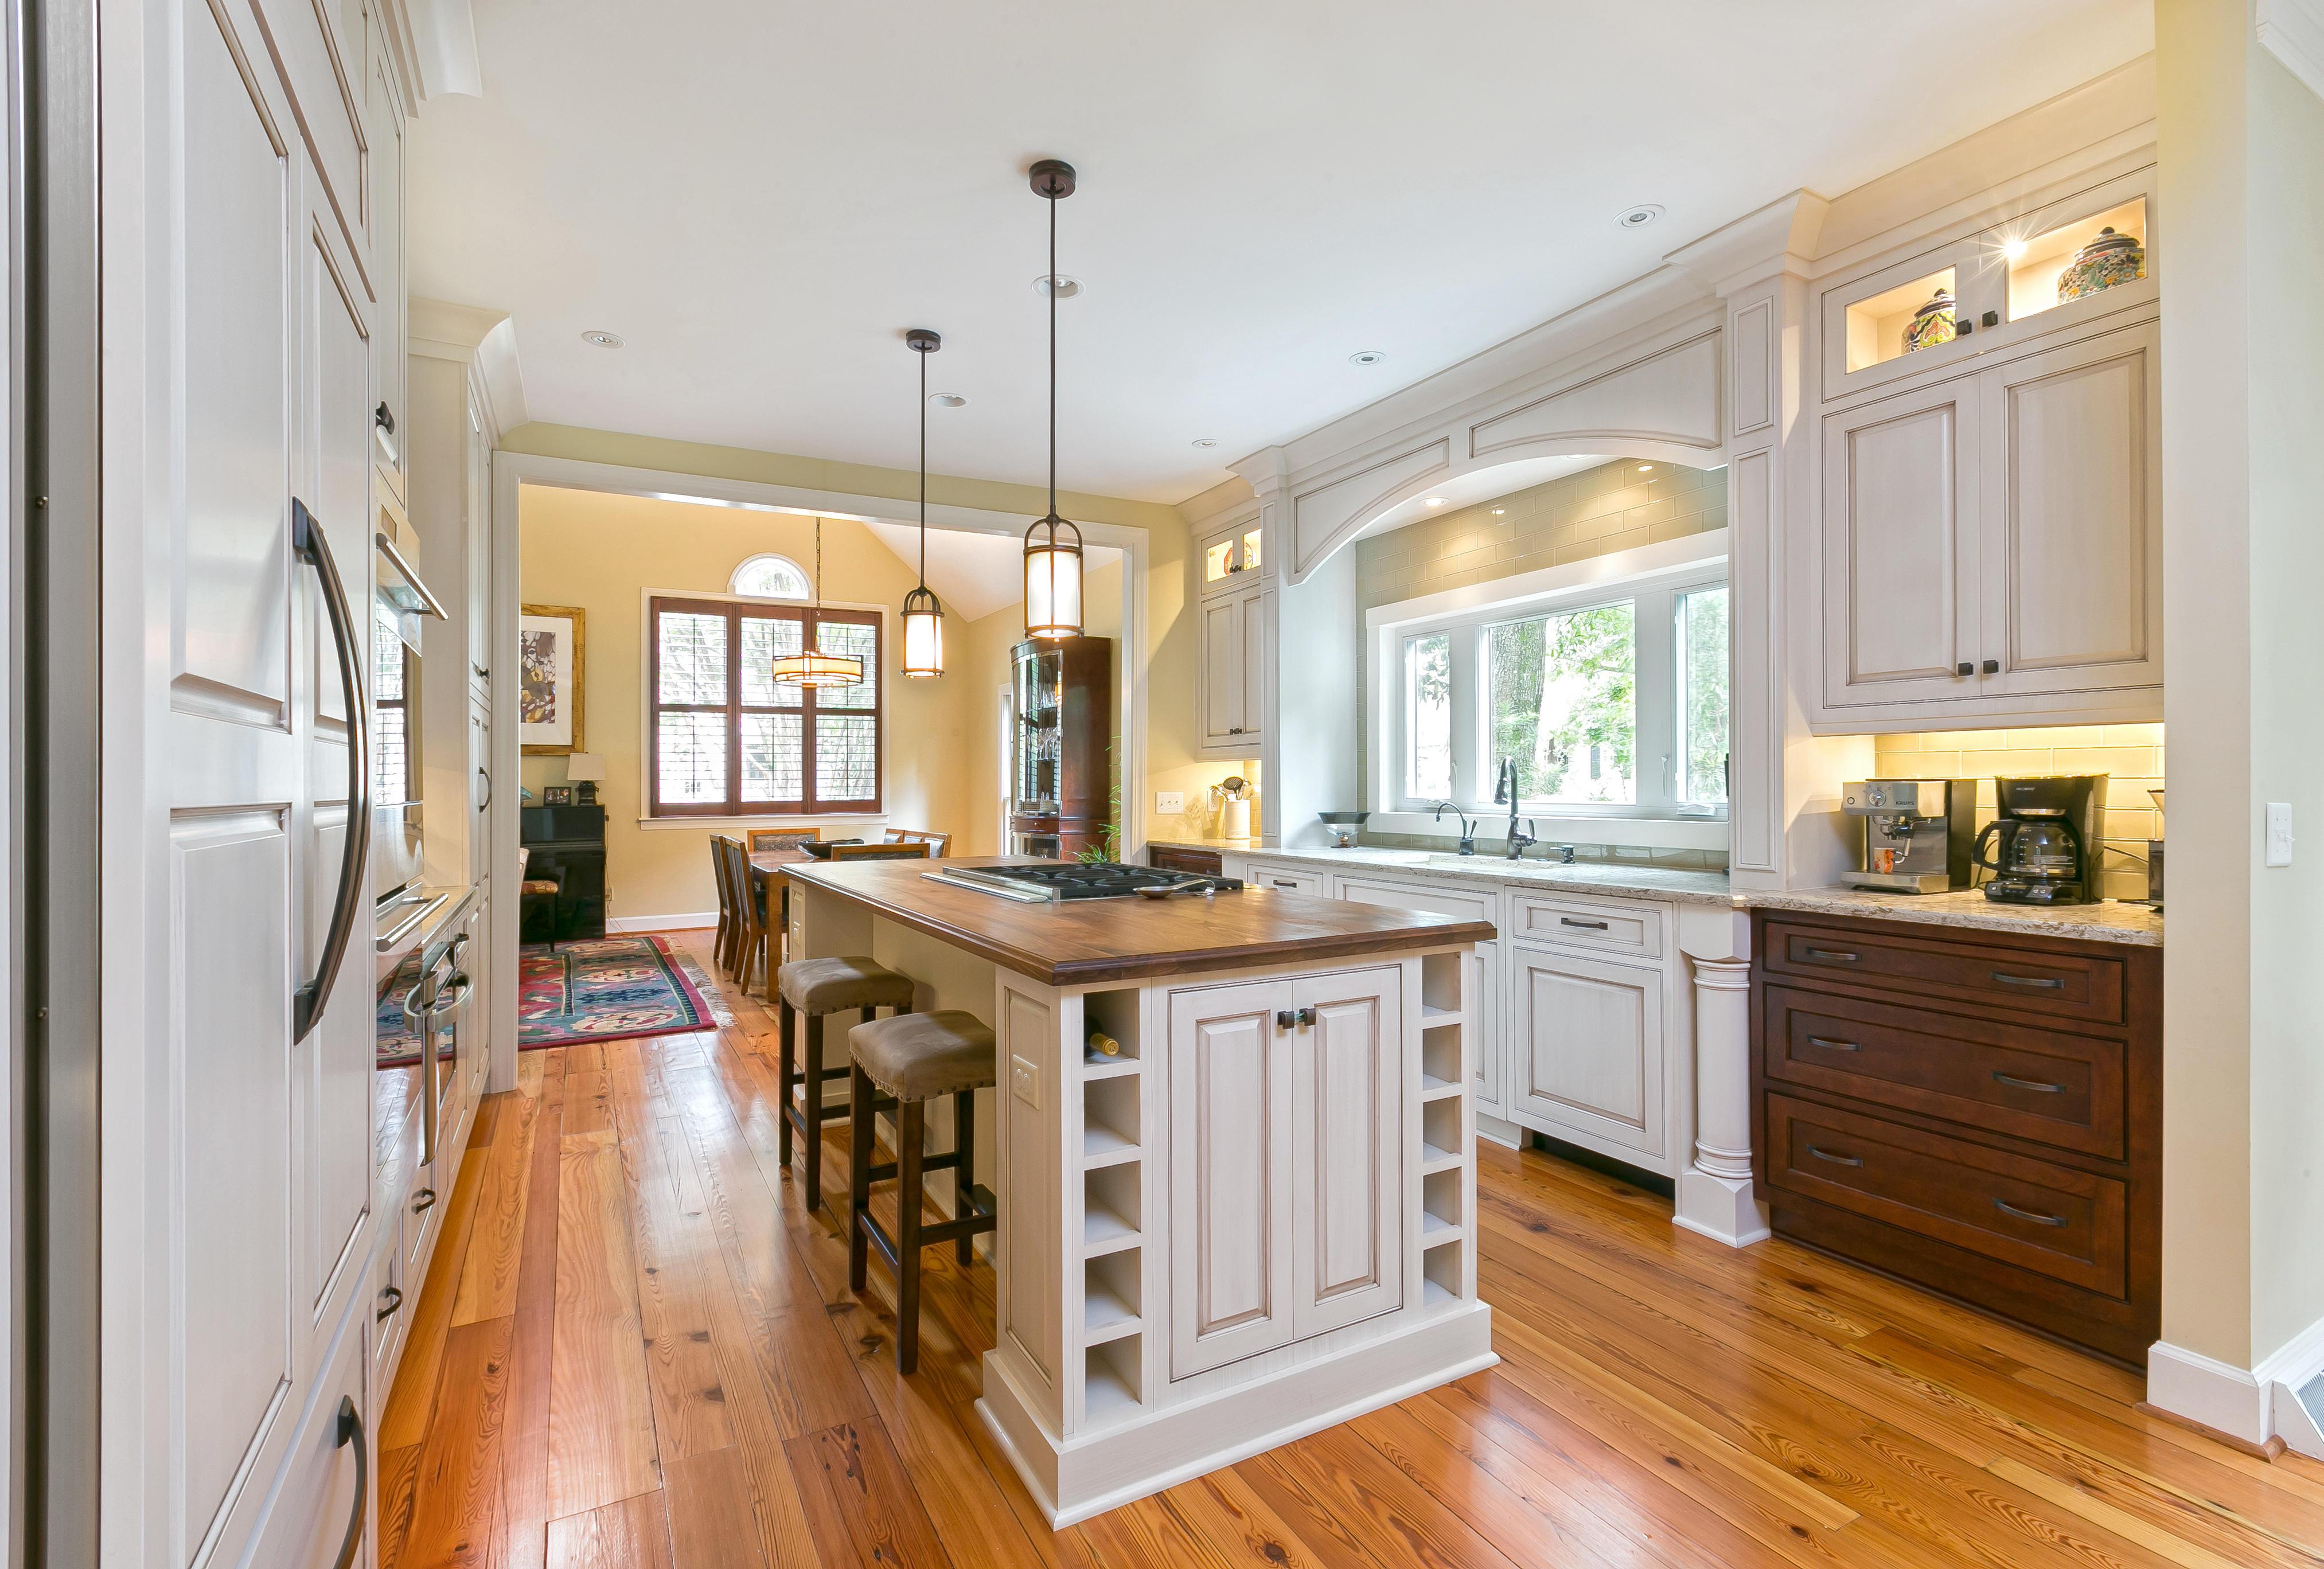 Southeast Kitchens image 4